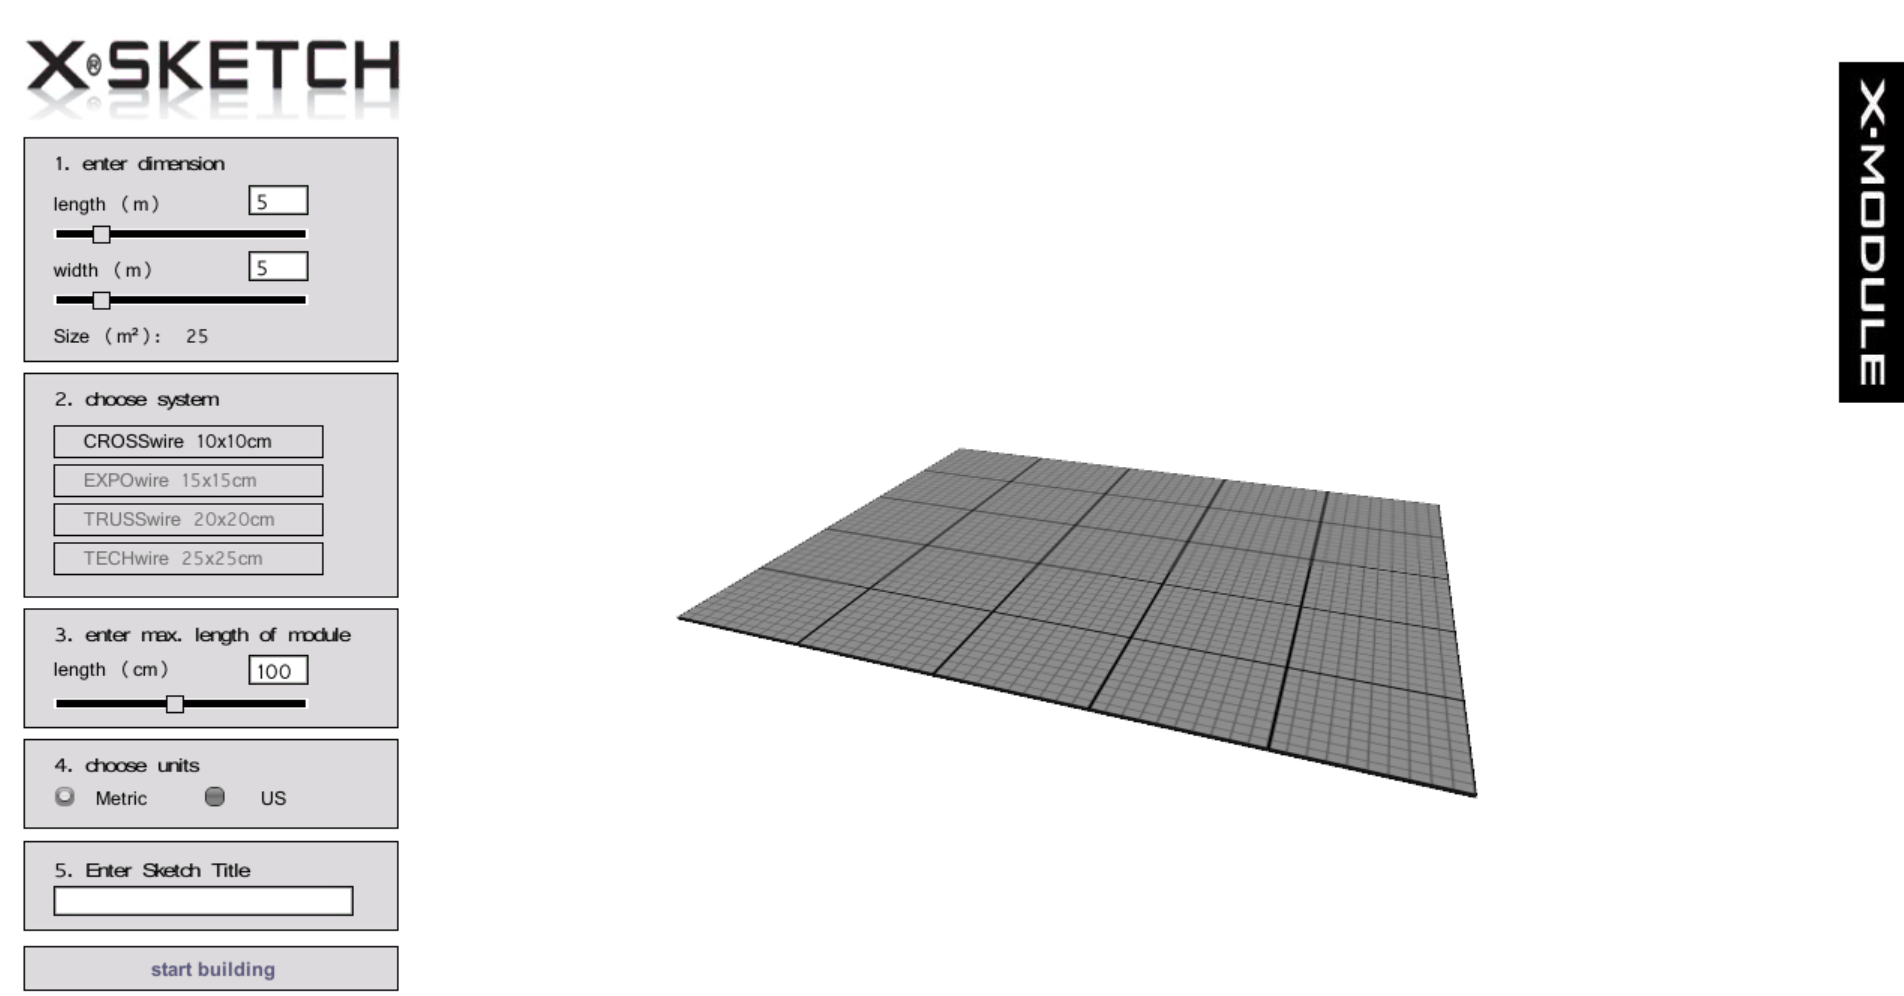 X-Sketch – nemokama stendų projektavimo programa